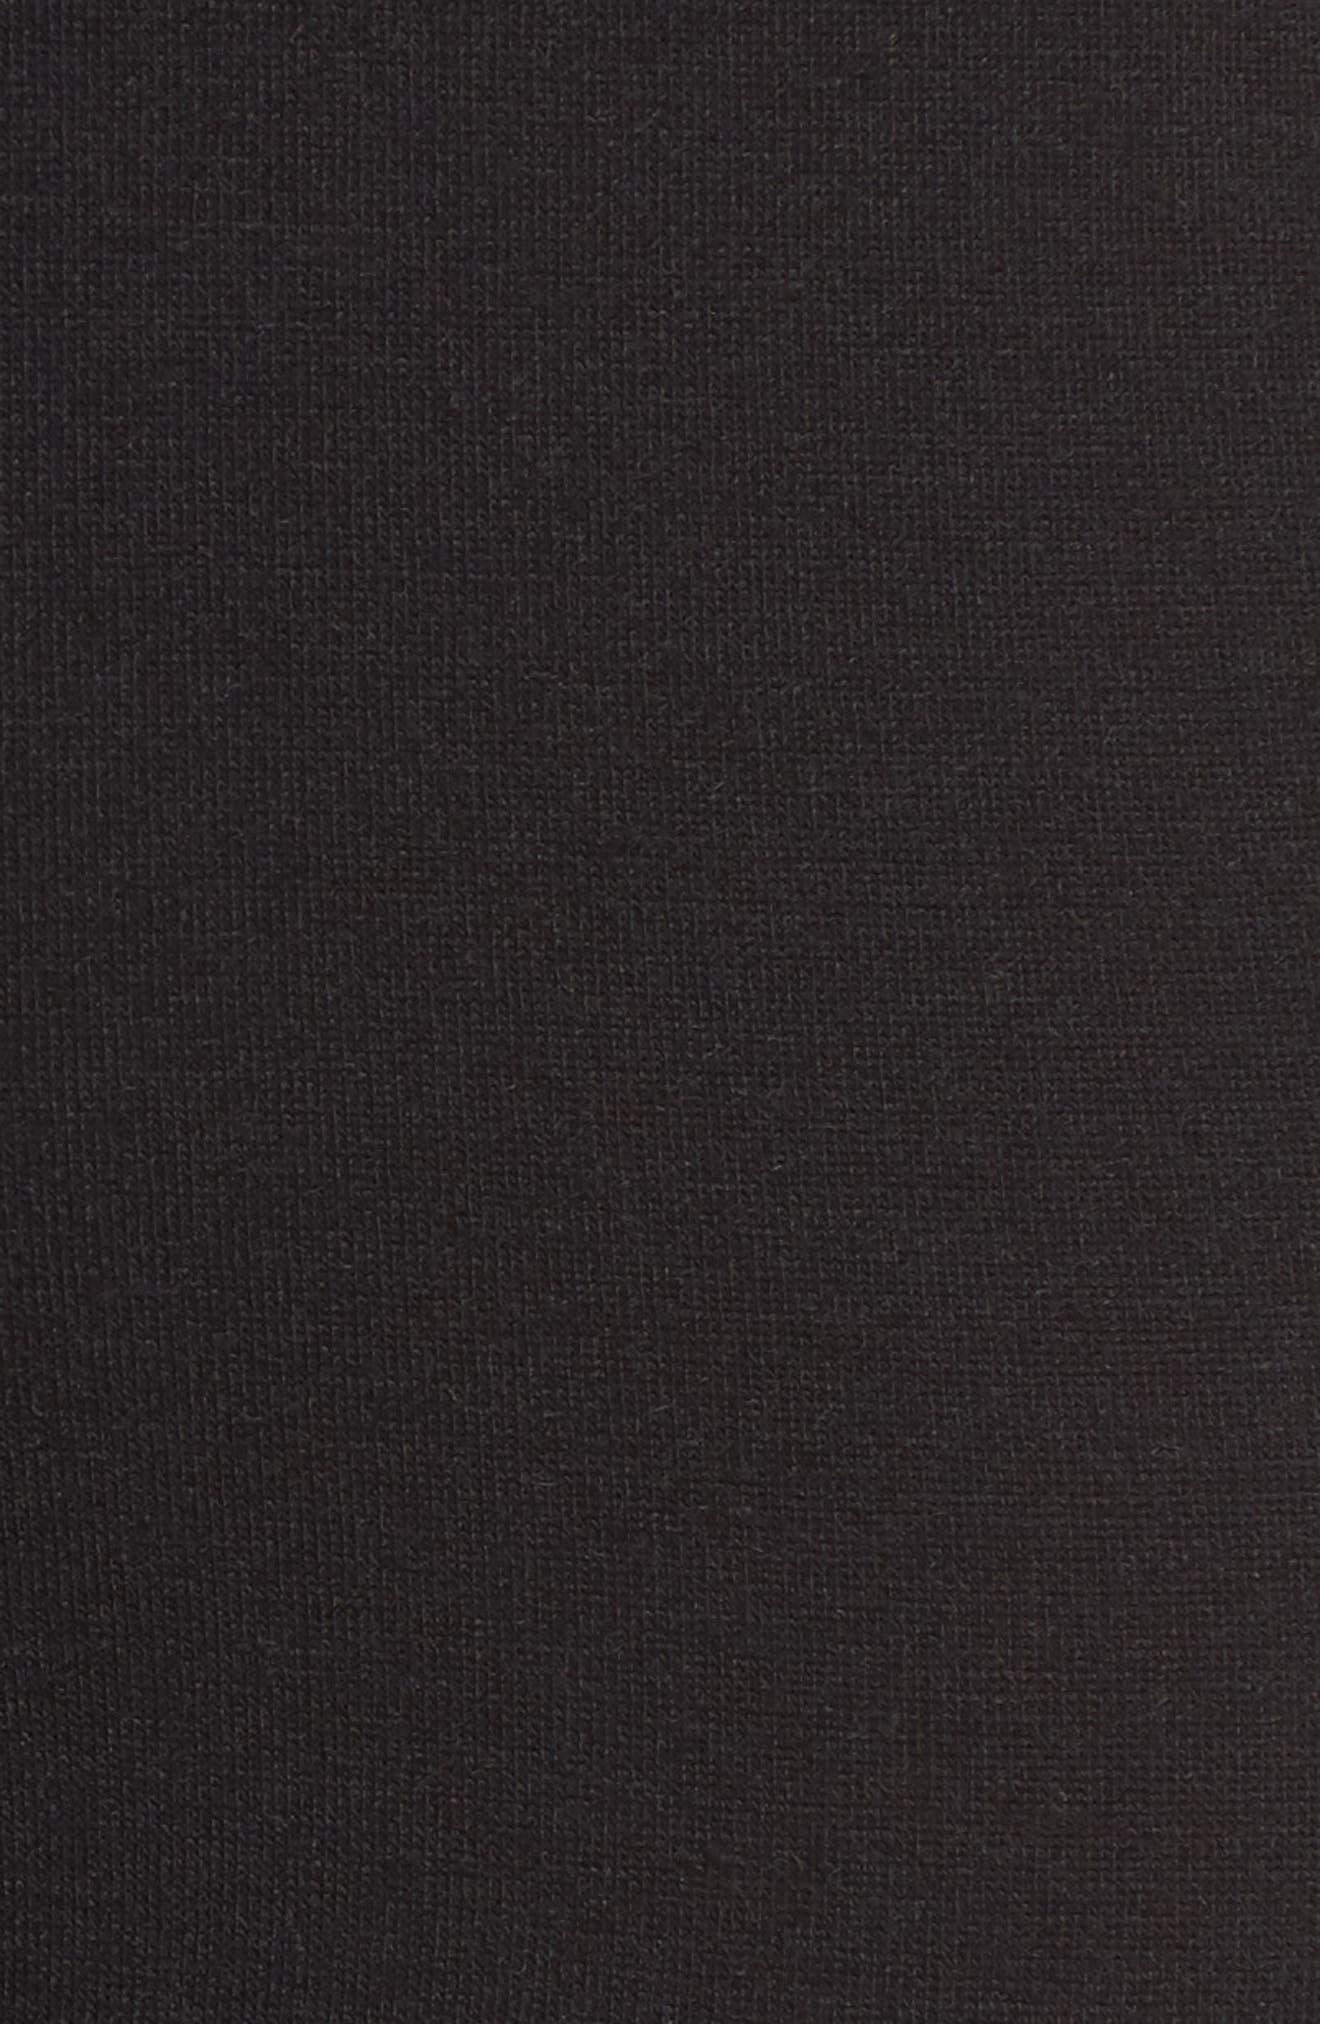 Knit Leggings,                             Alternate thumbnail 5, color,                             001